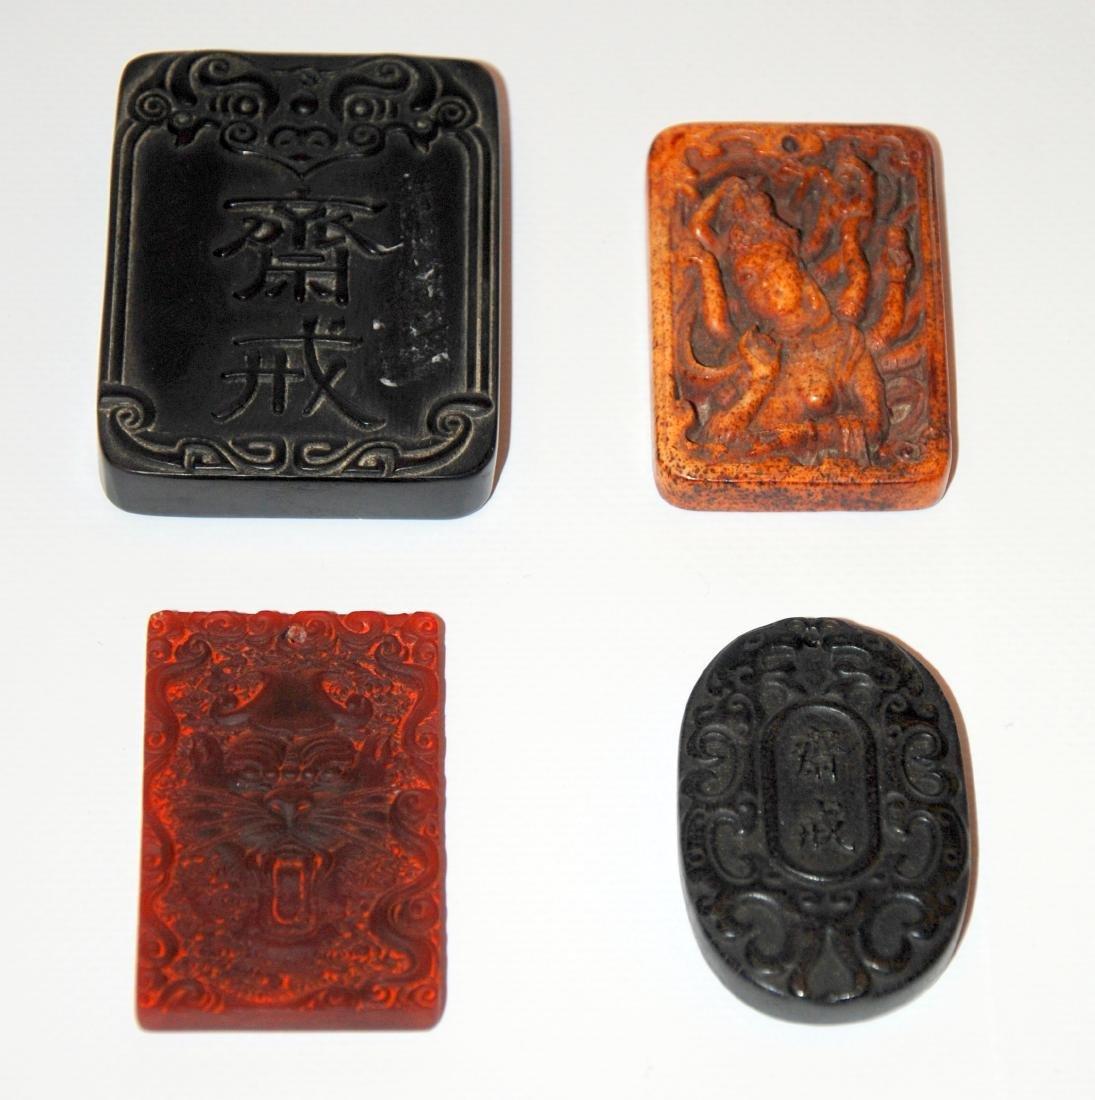 lotto n 4 oggetti vari